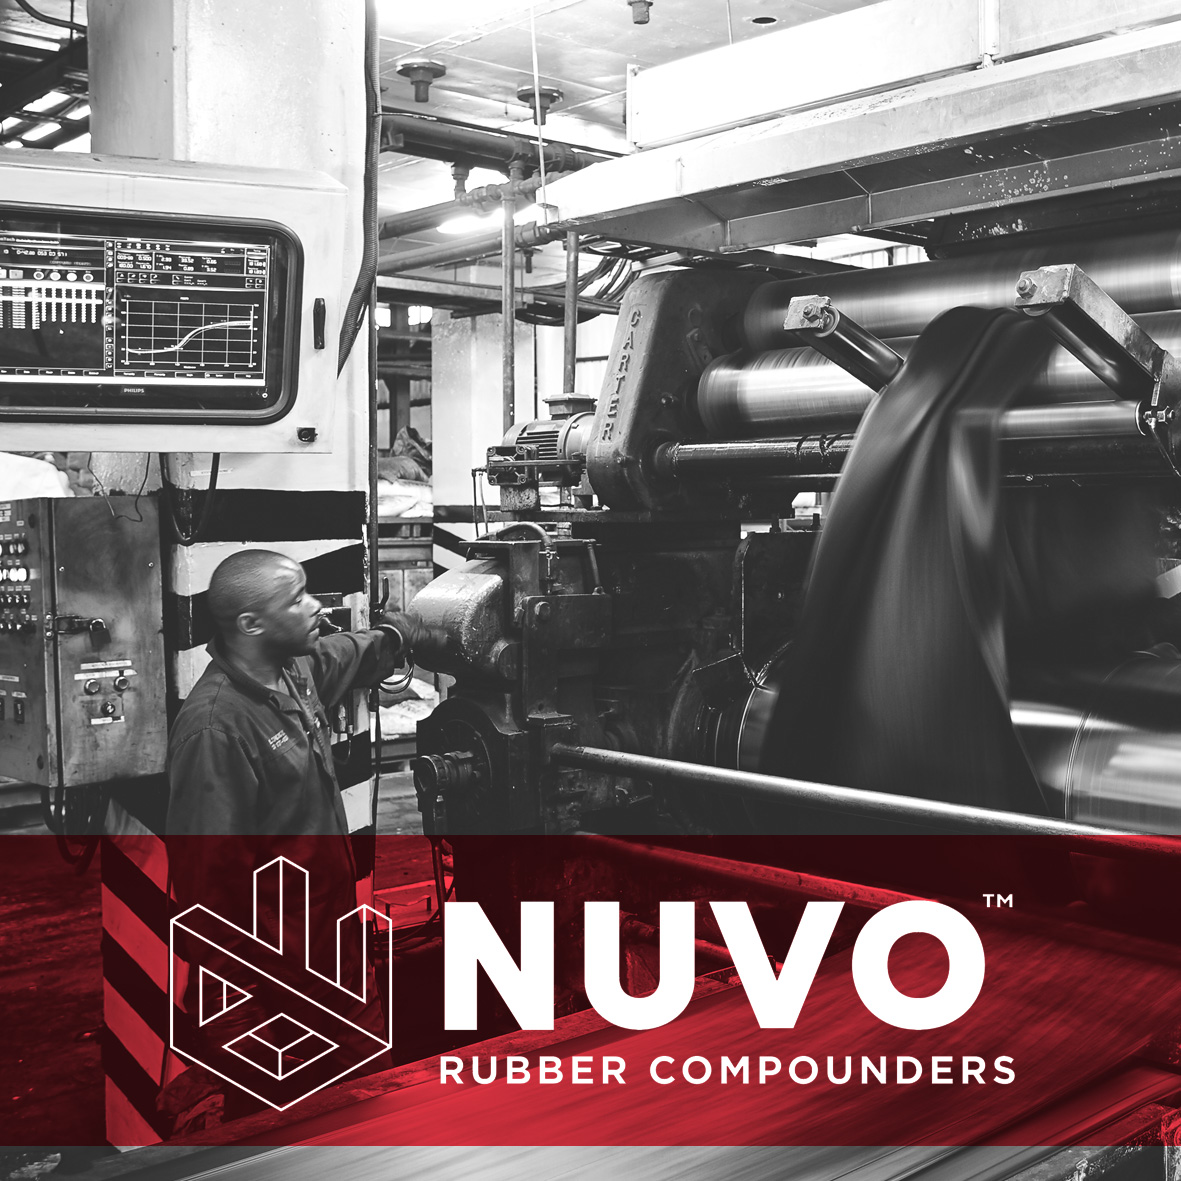 nuvo logos_compounders.jpg